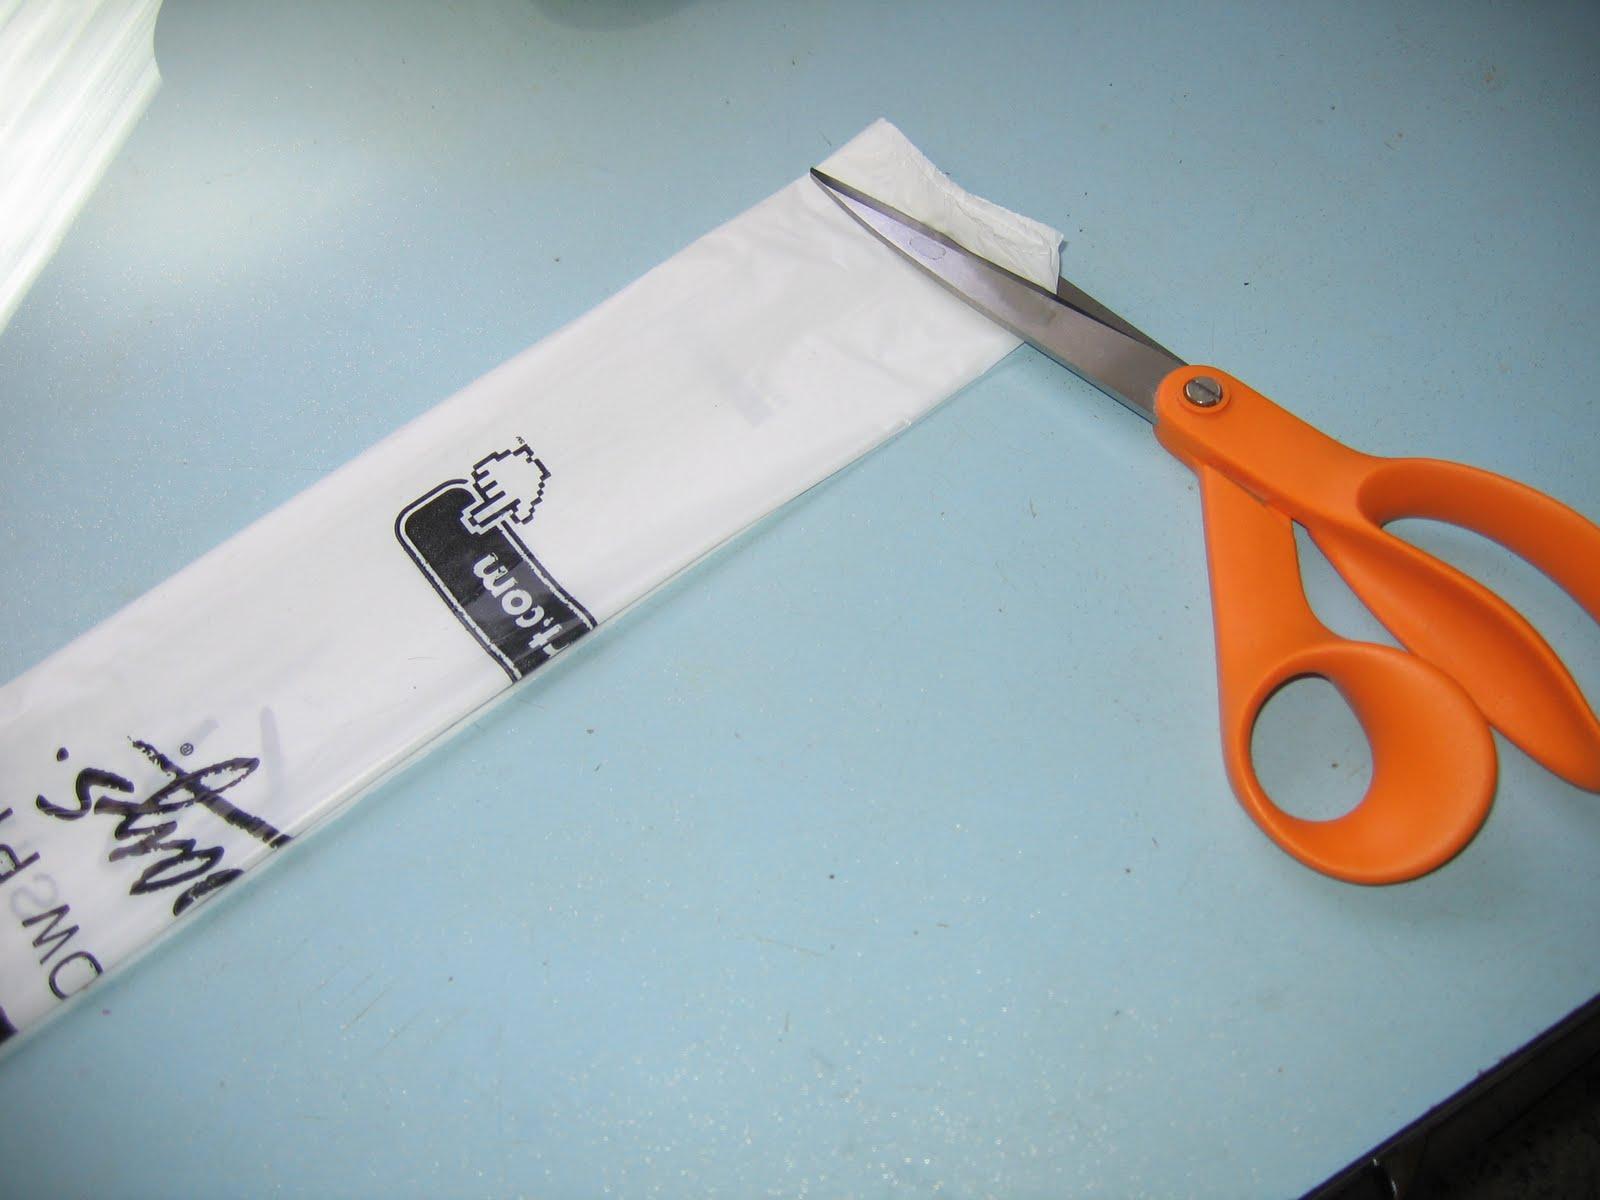 Plastic Bag Rugs | Plastic Bag Crochet Rug - How To